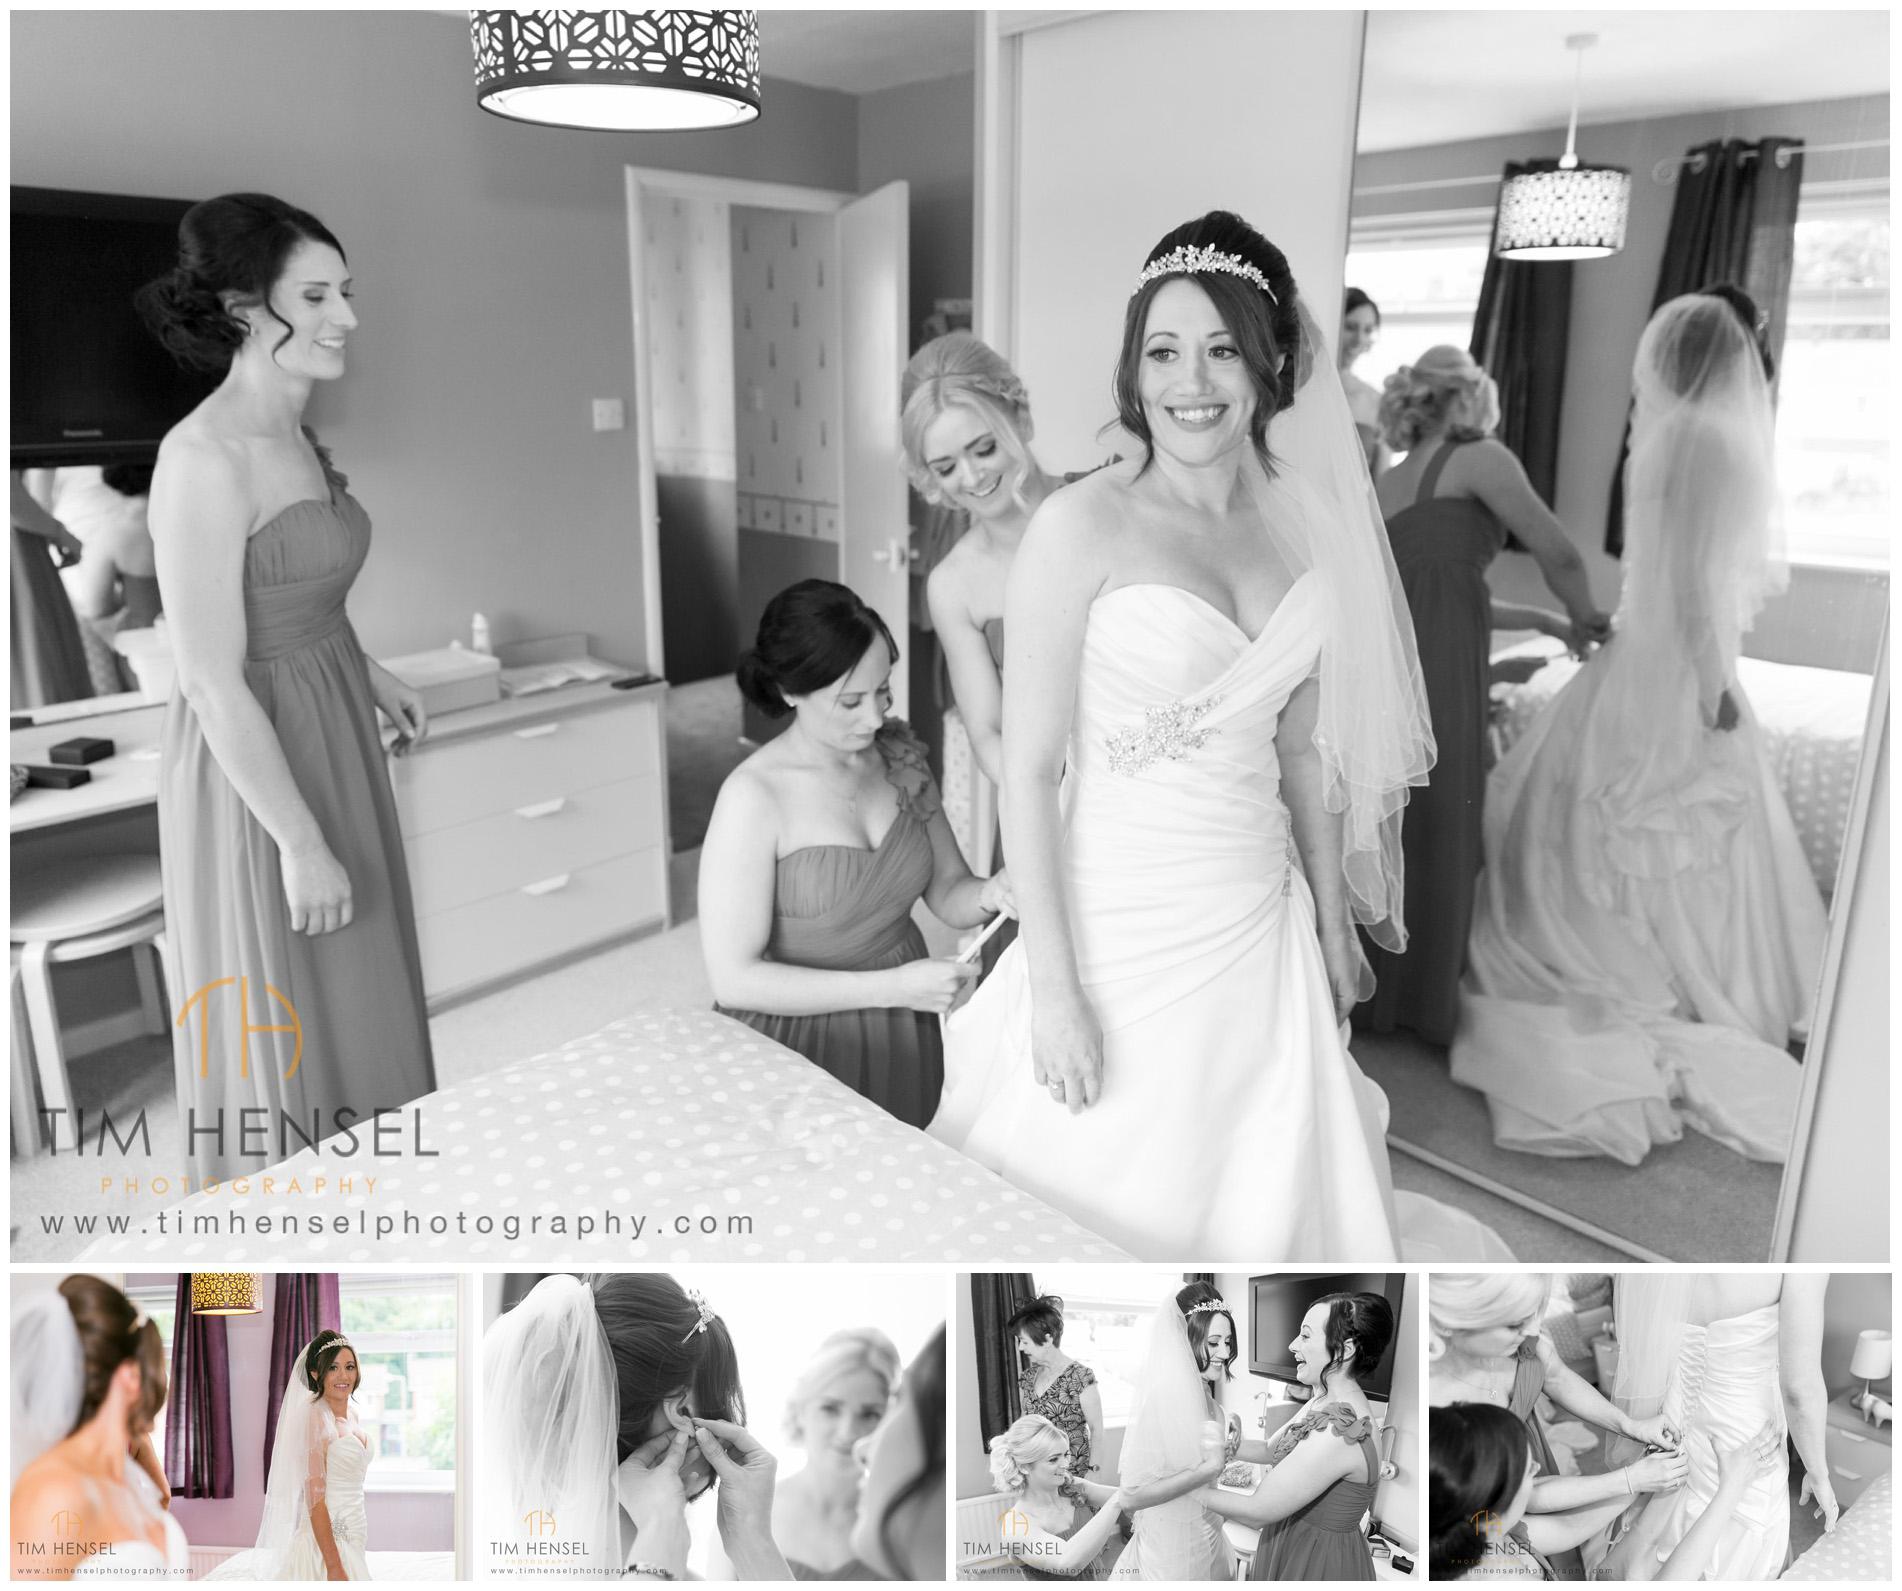 Bridal preparation wedding photographs